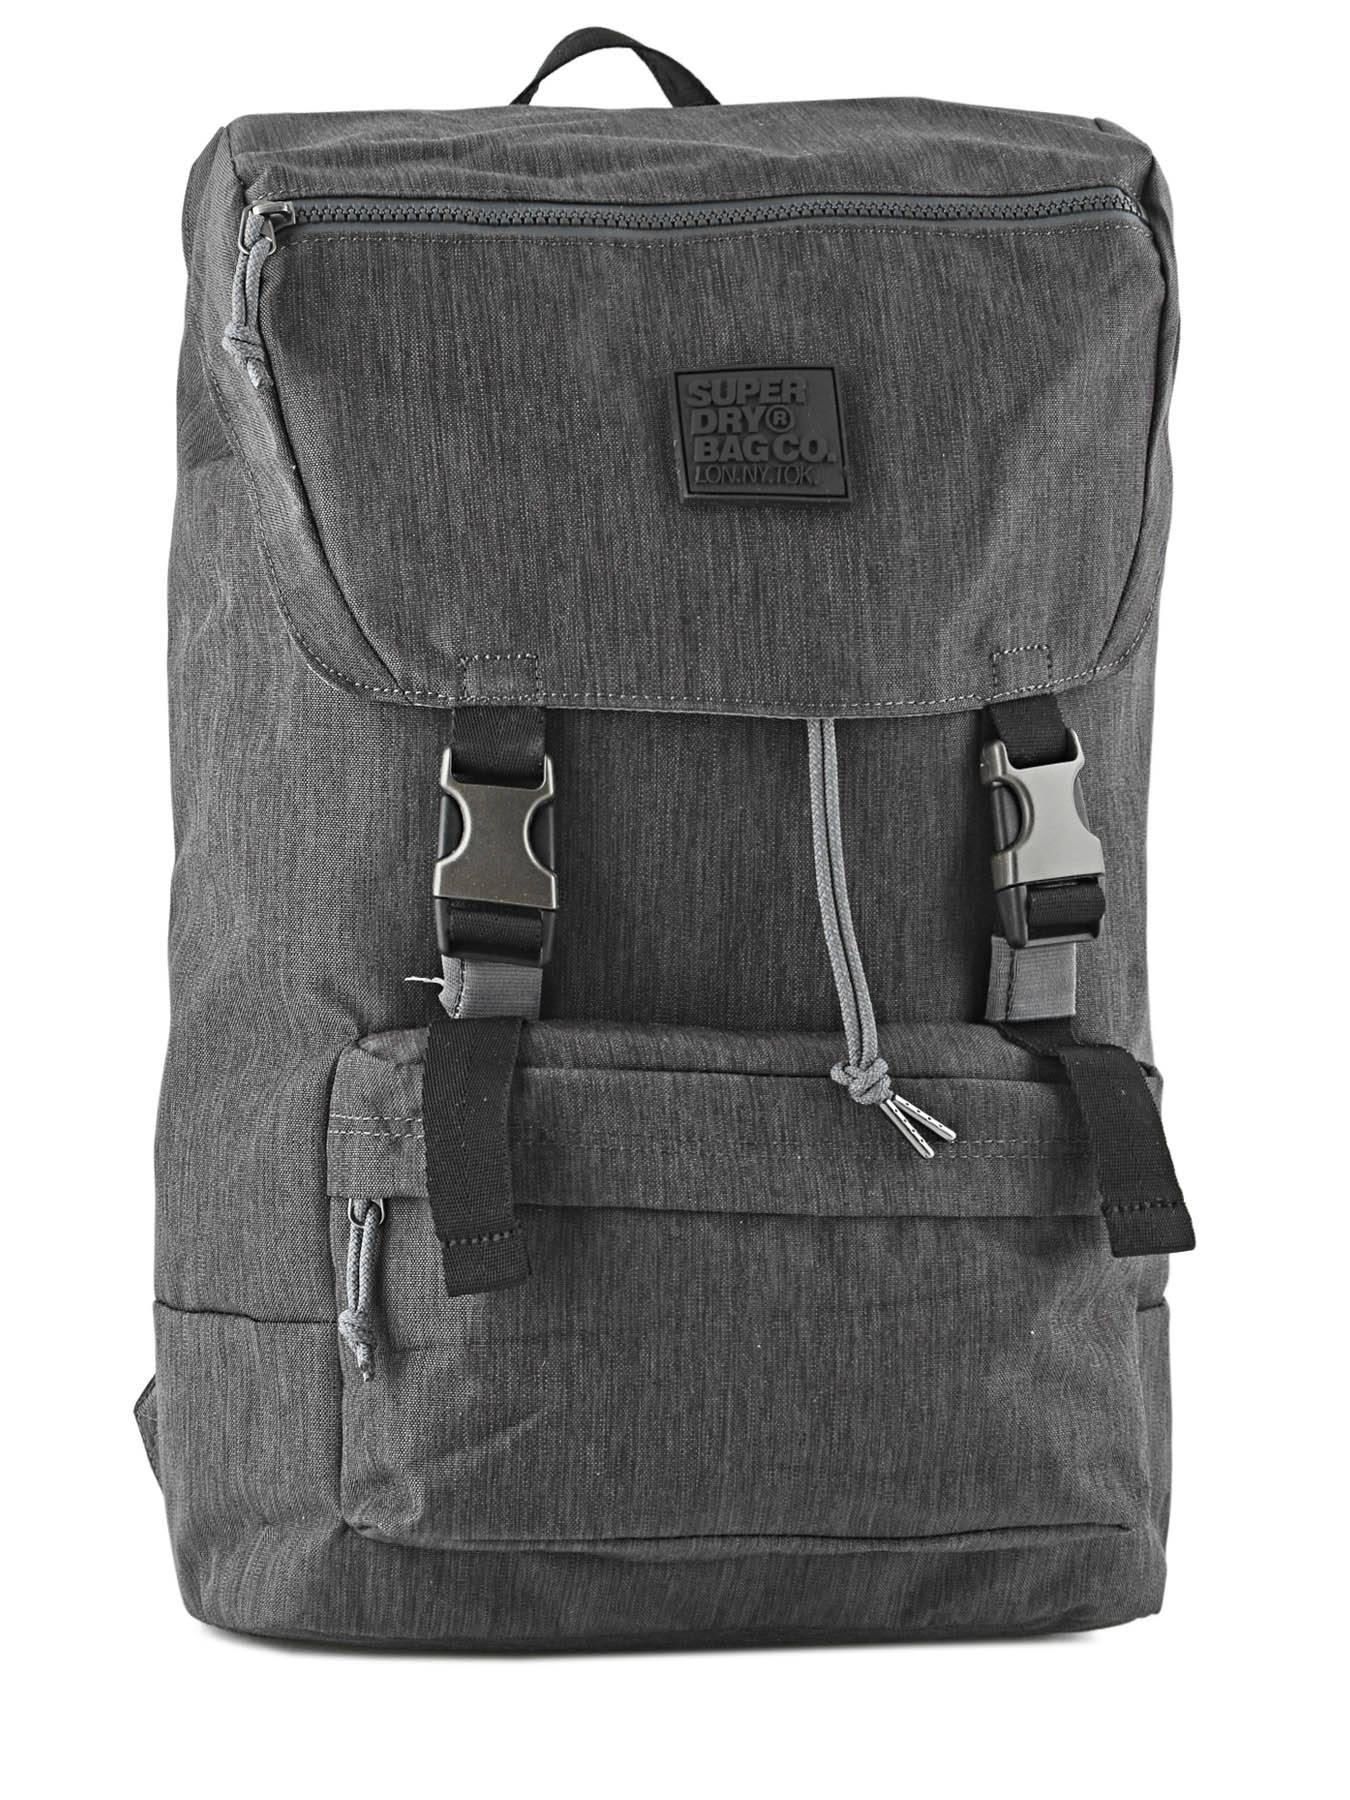 ... Backpack 1 Compartment Superdry Gray backpack men M91001JP ... 39de3862de7fc